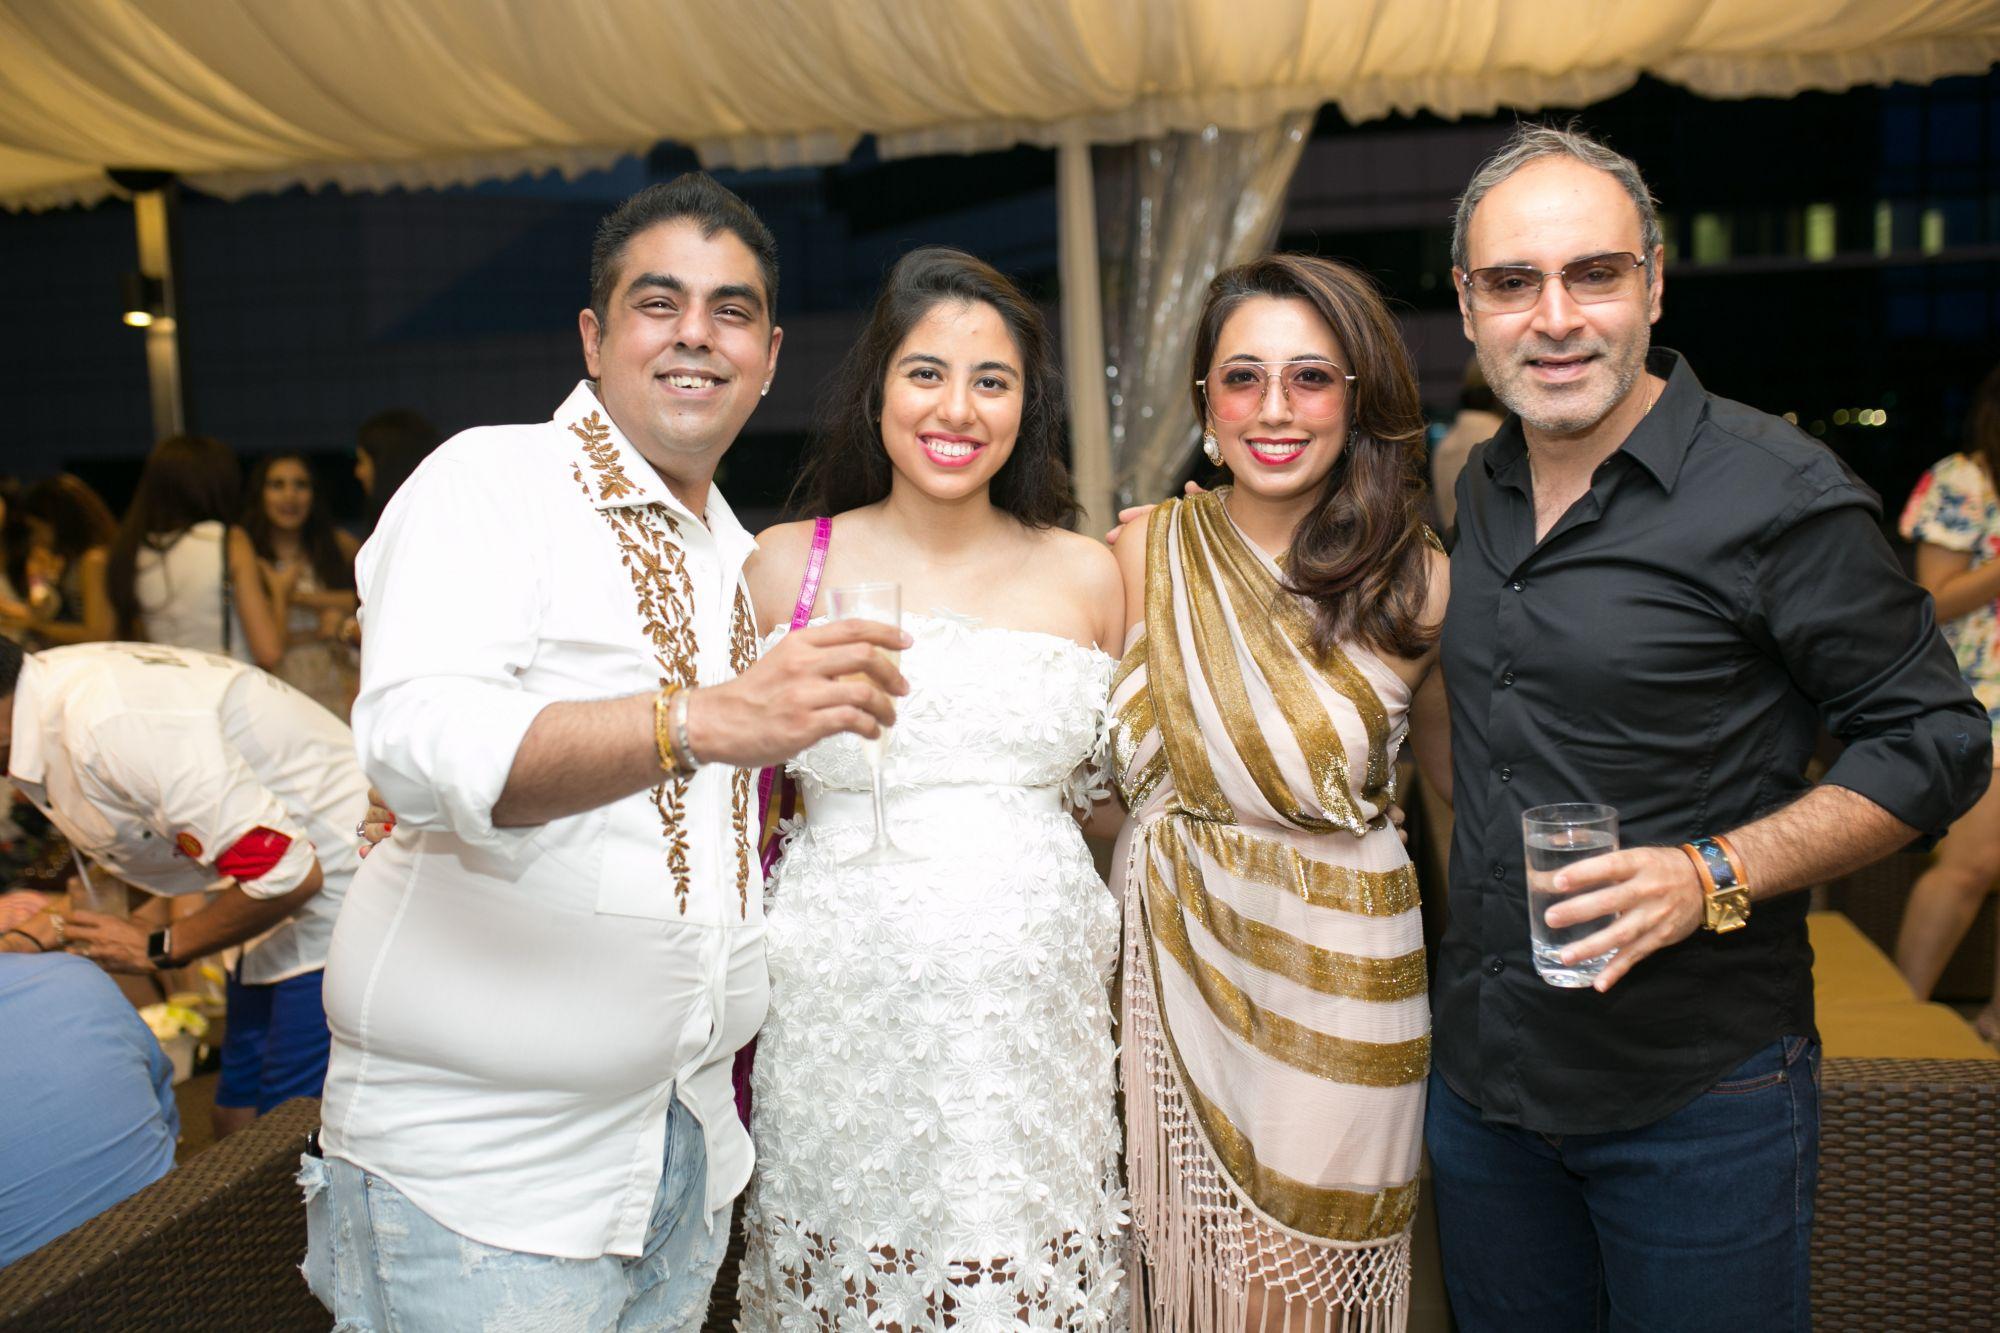 Bobby Hiranandani, Shaila Hiranandani, Dimple Aswani, Sameer Aswani